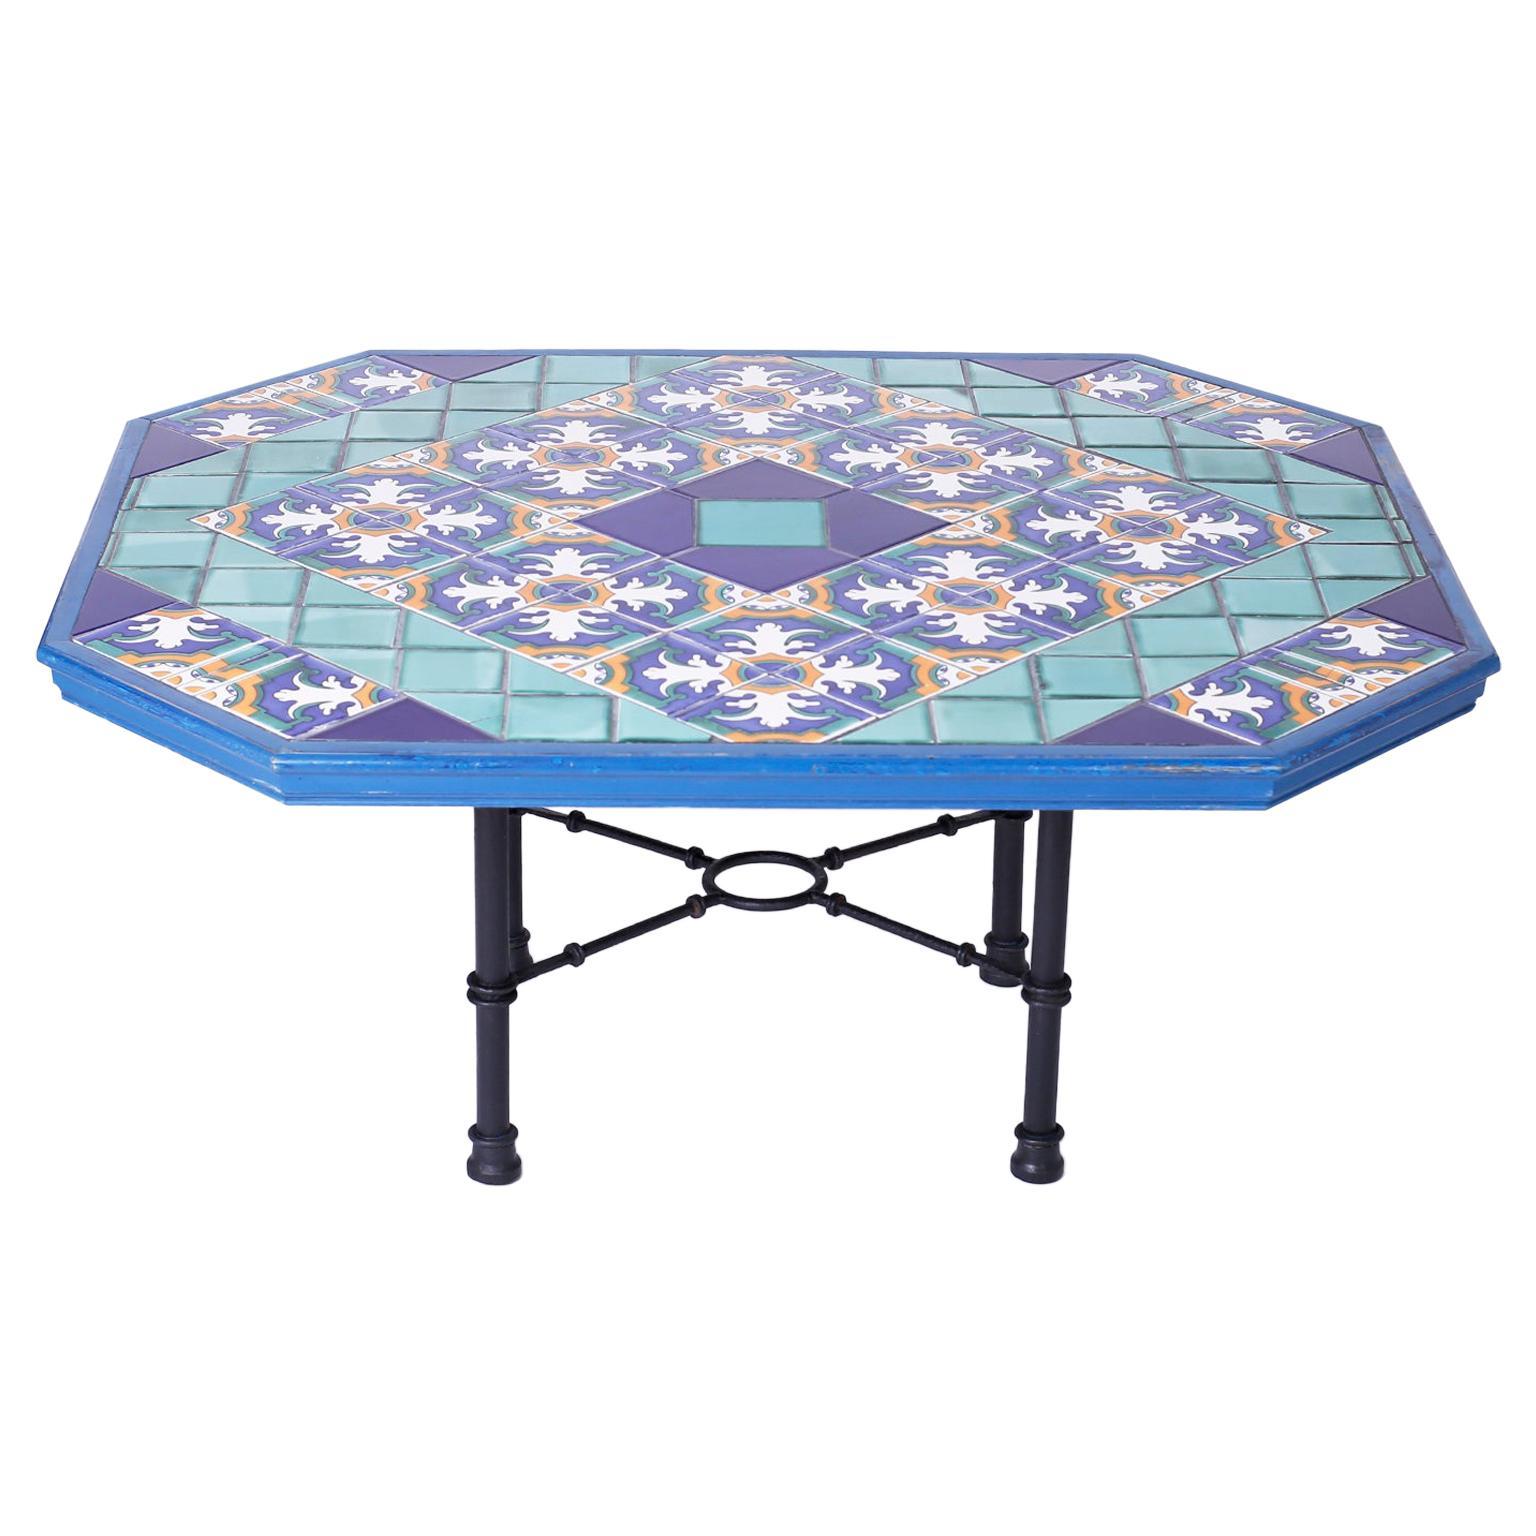 Italian Tile Top Dining Table